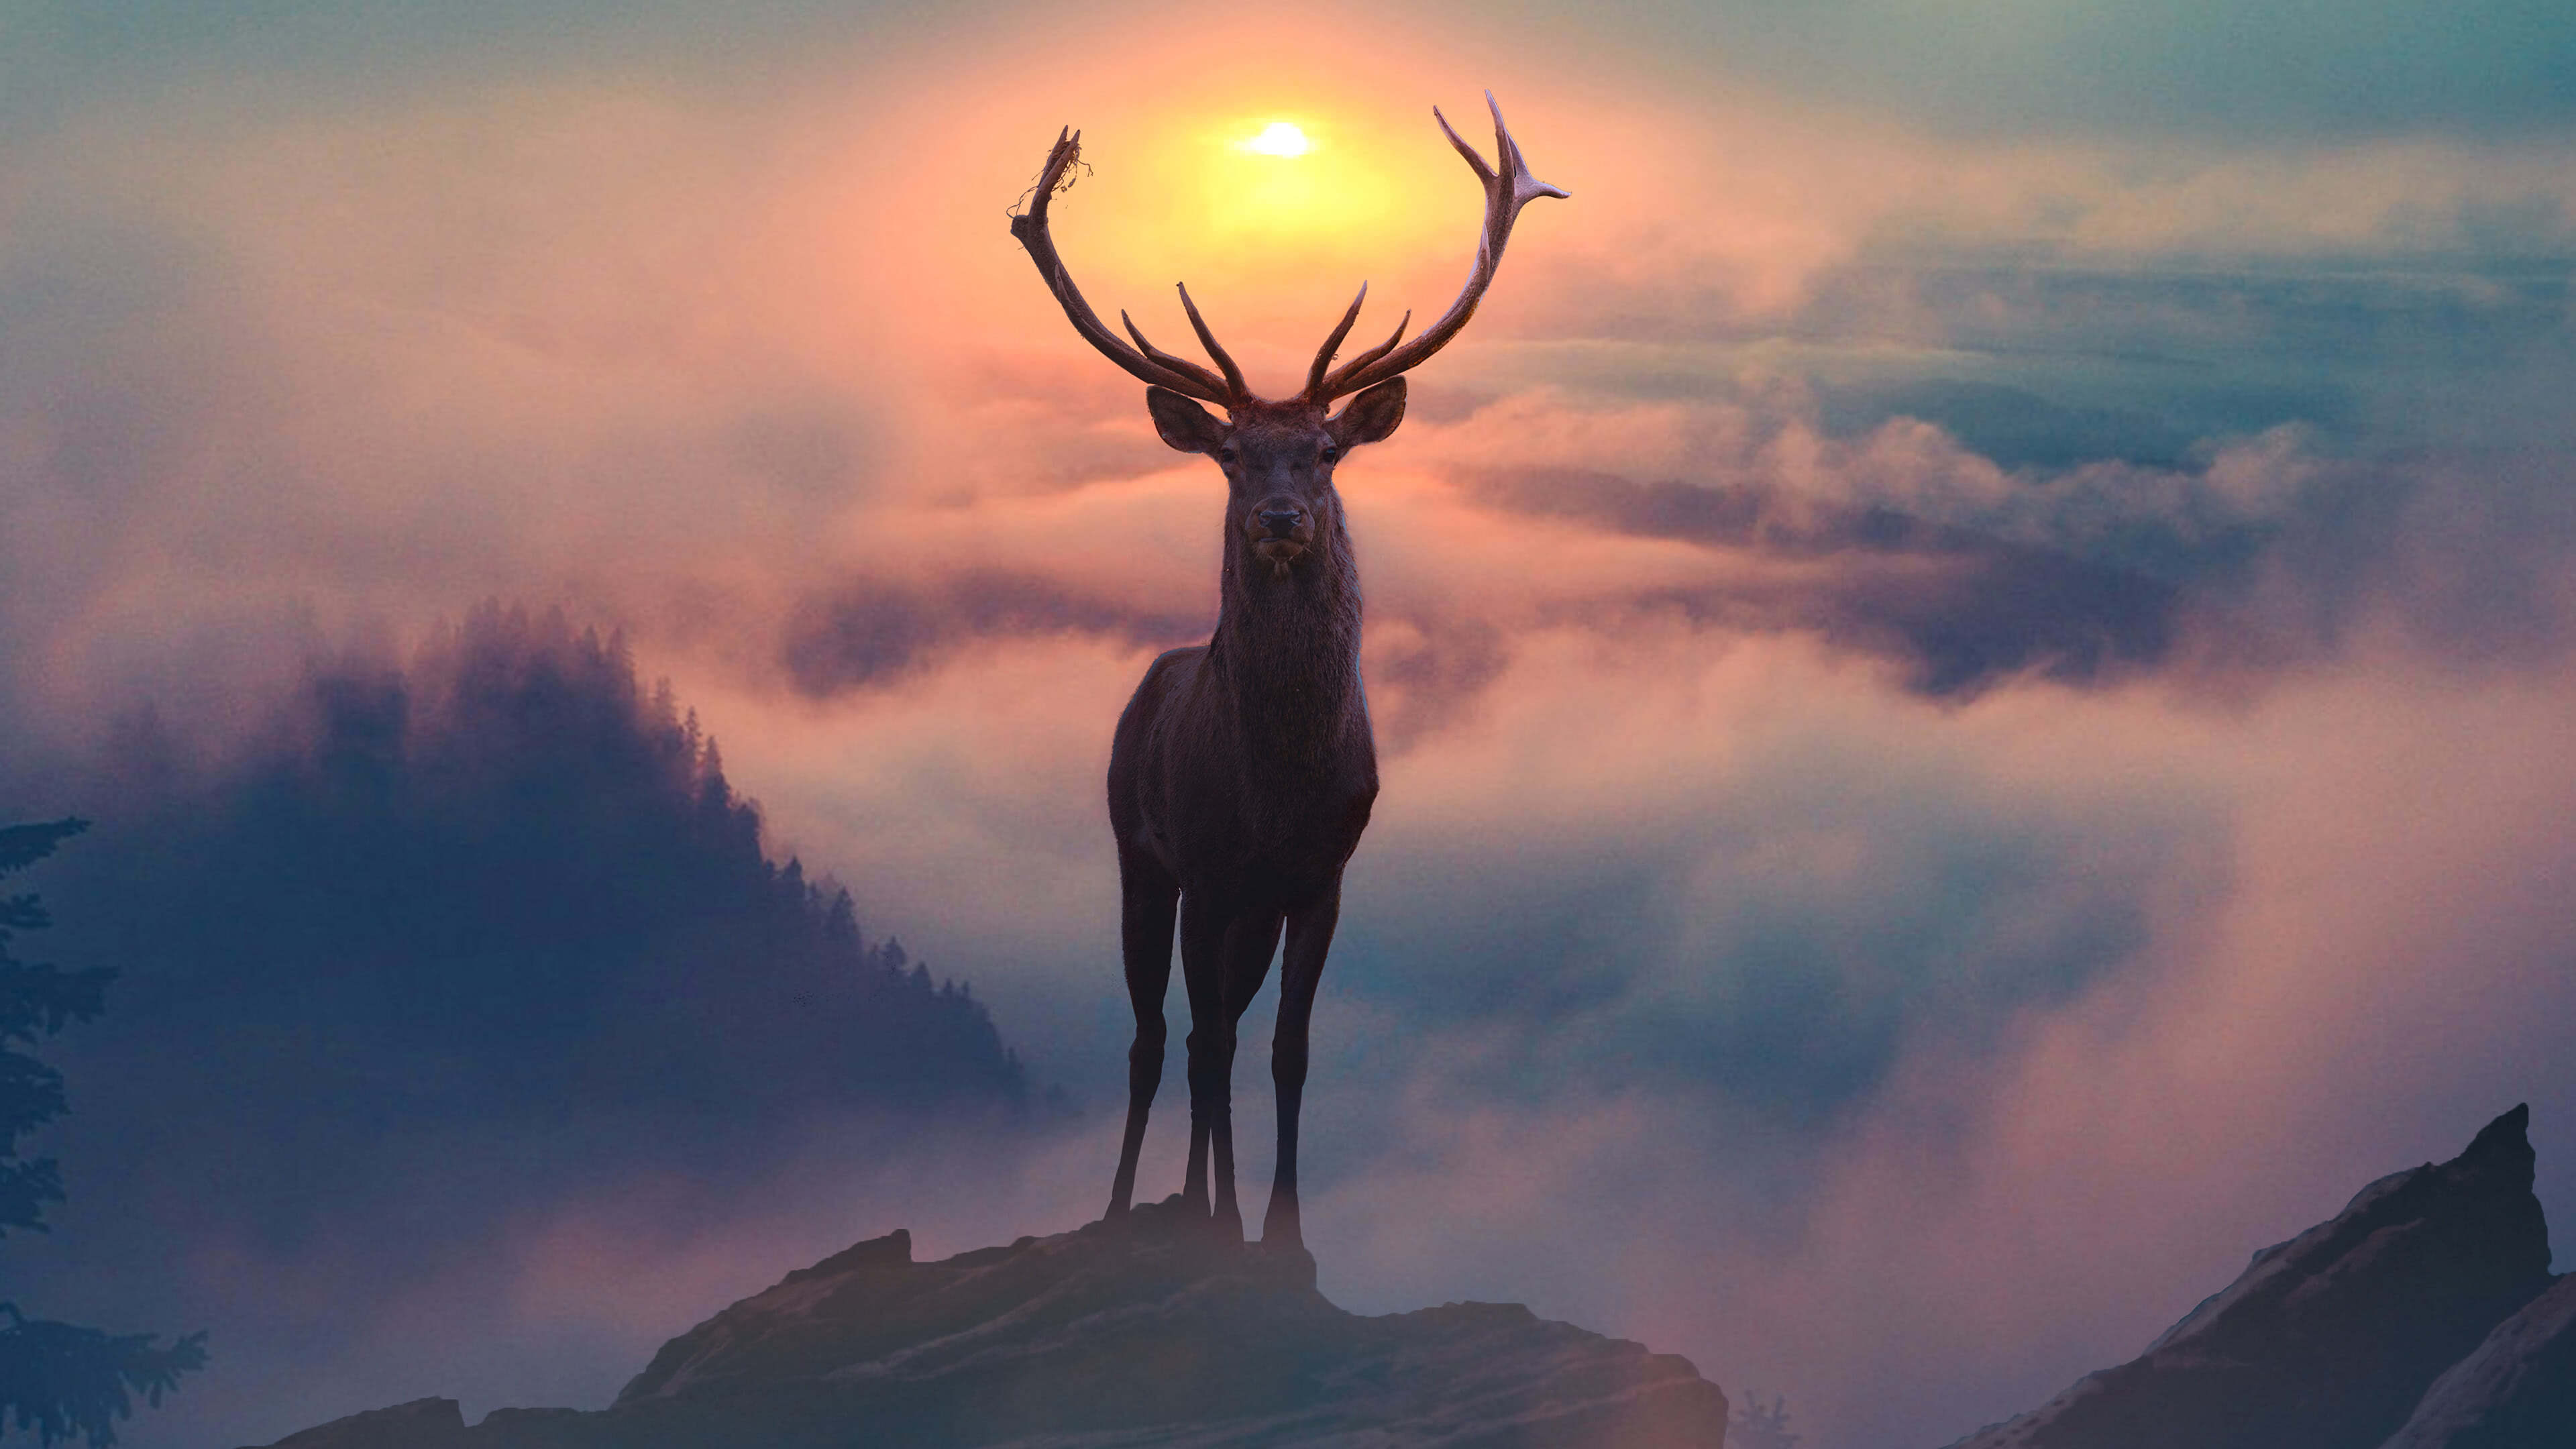 reindeer mountain fog uhd 4k wallpaper